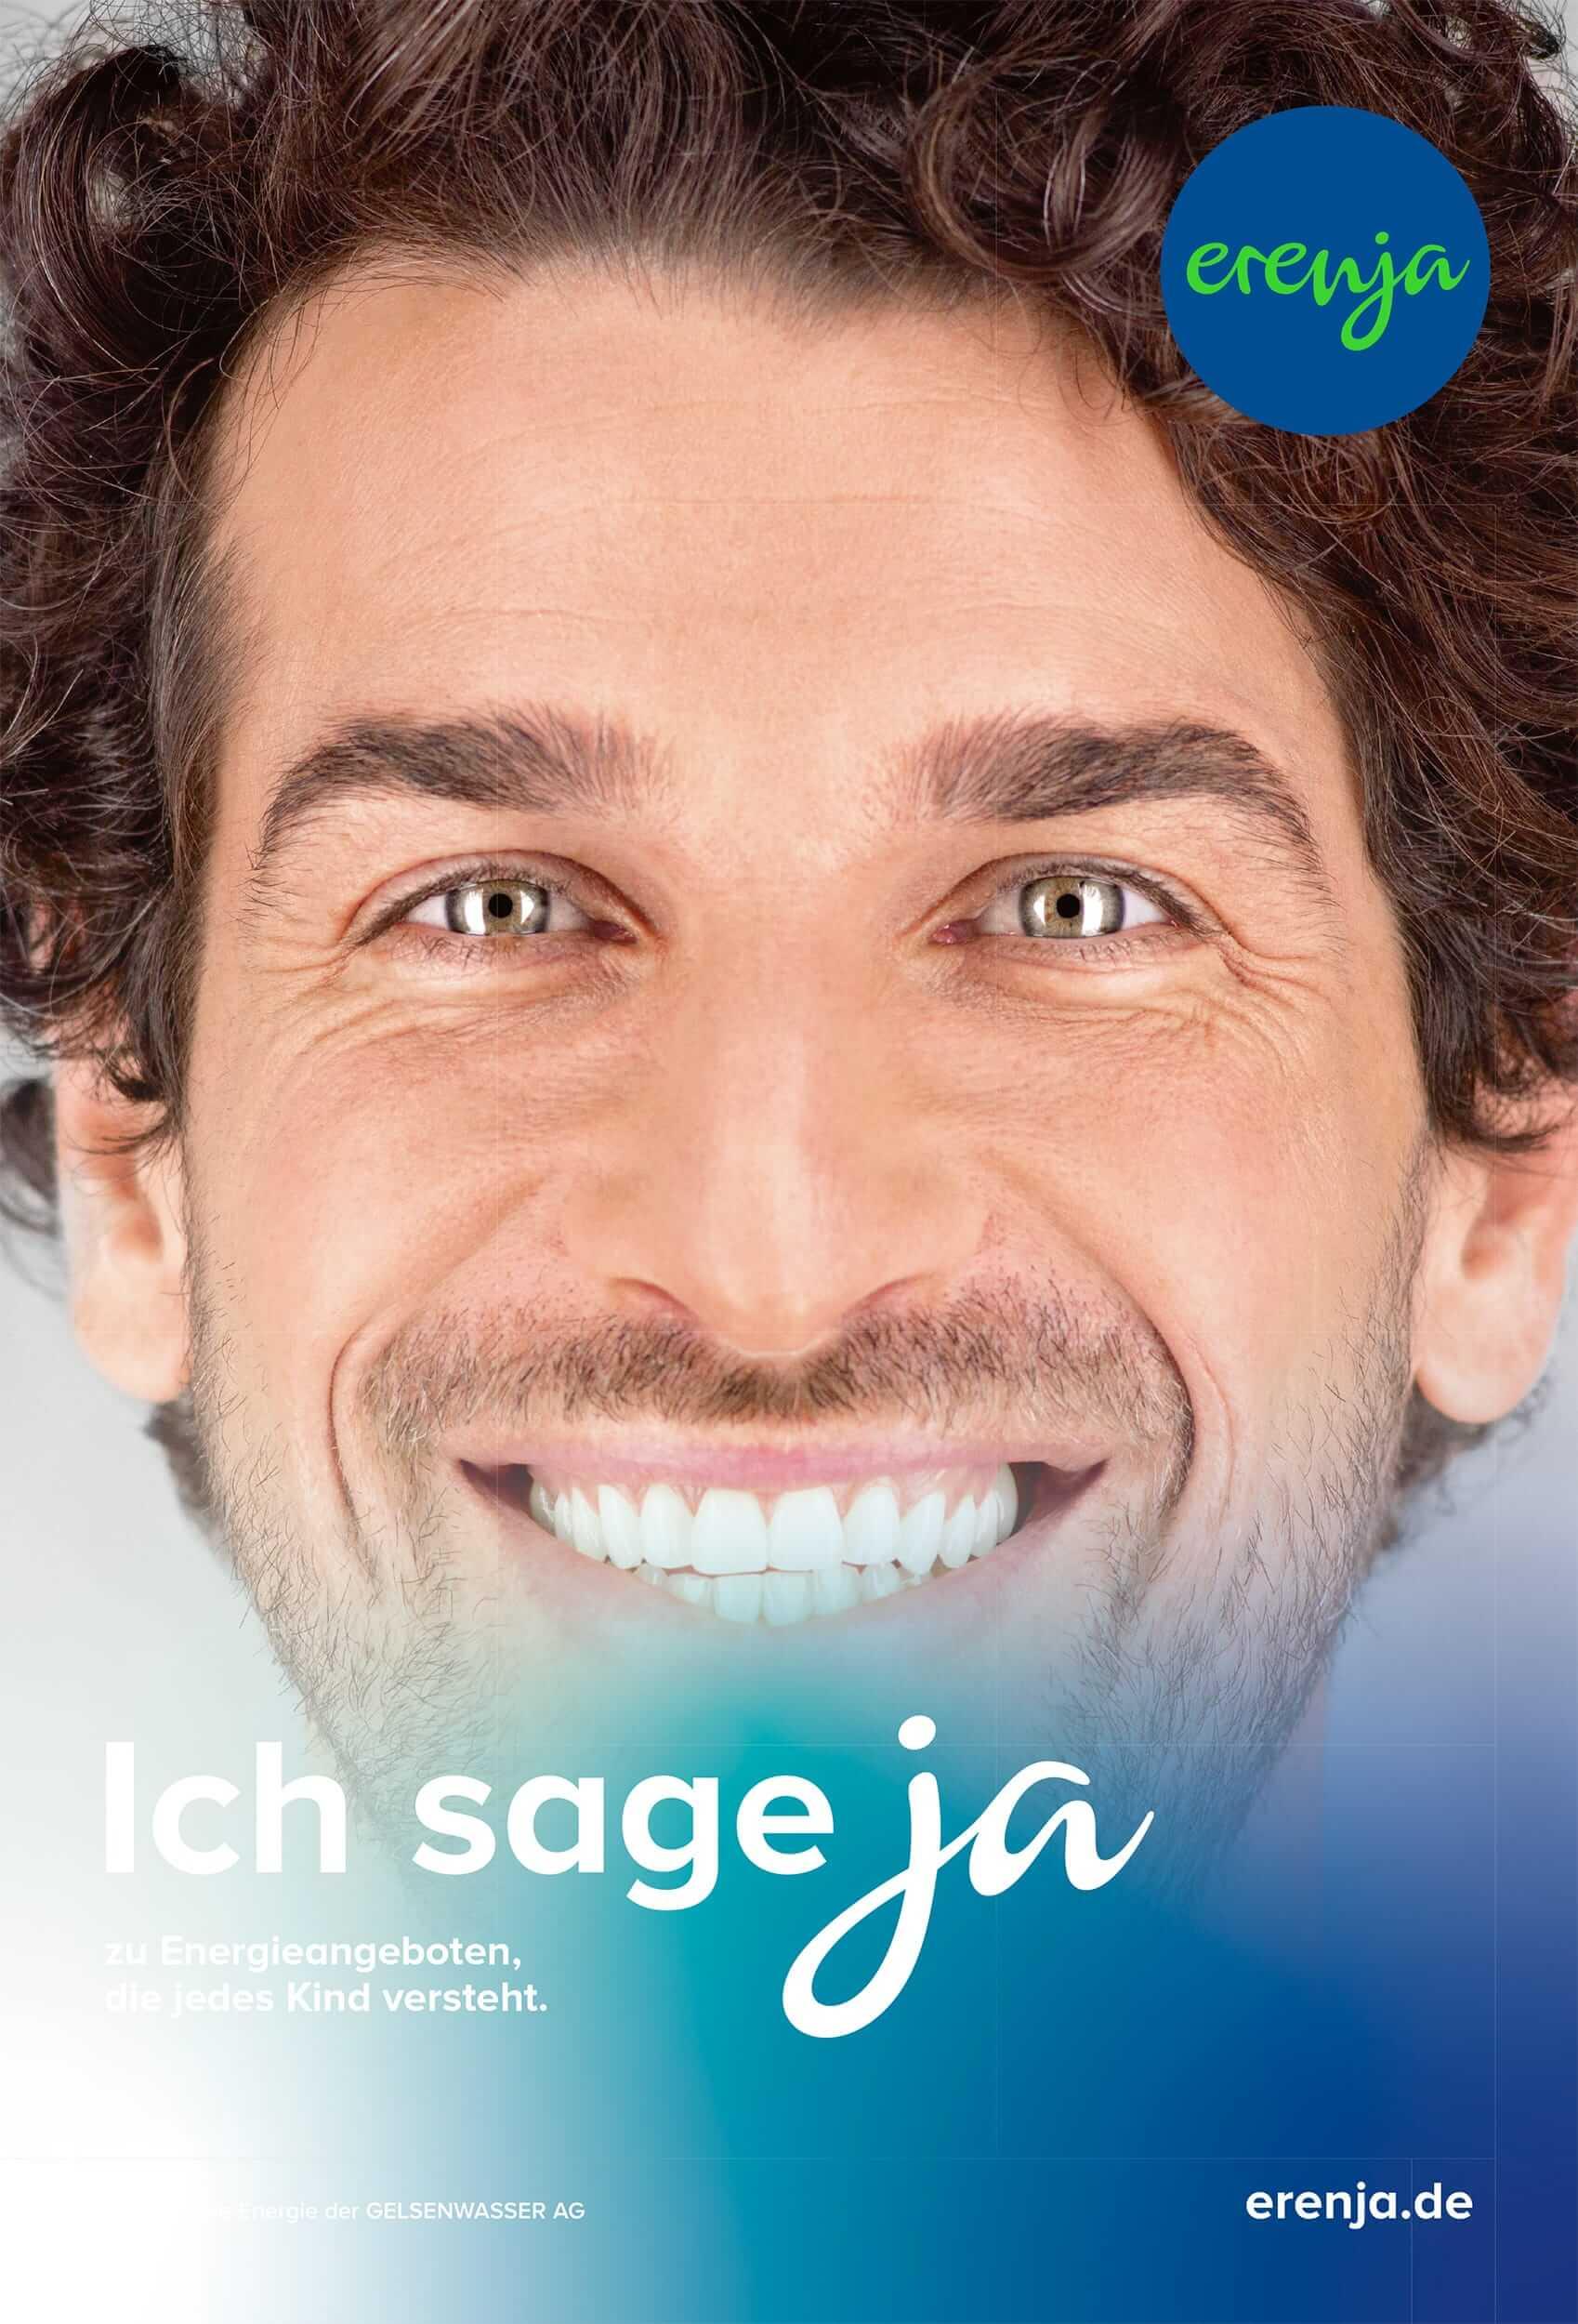 Bildschirm_EJA-IMG-PLK—Einführung-City-Light—1S-237x350mm-5c—d05-3